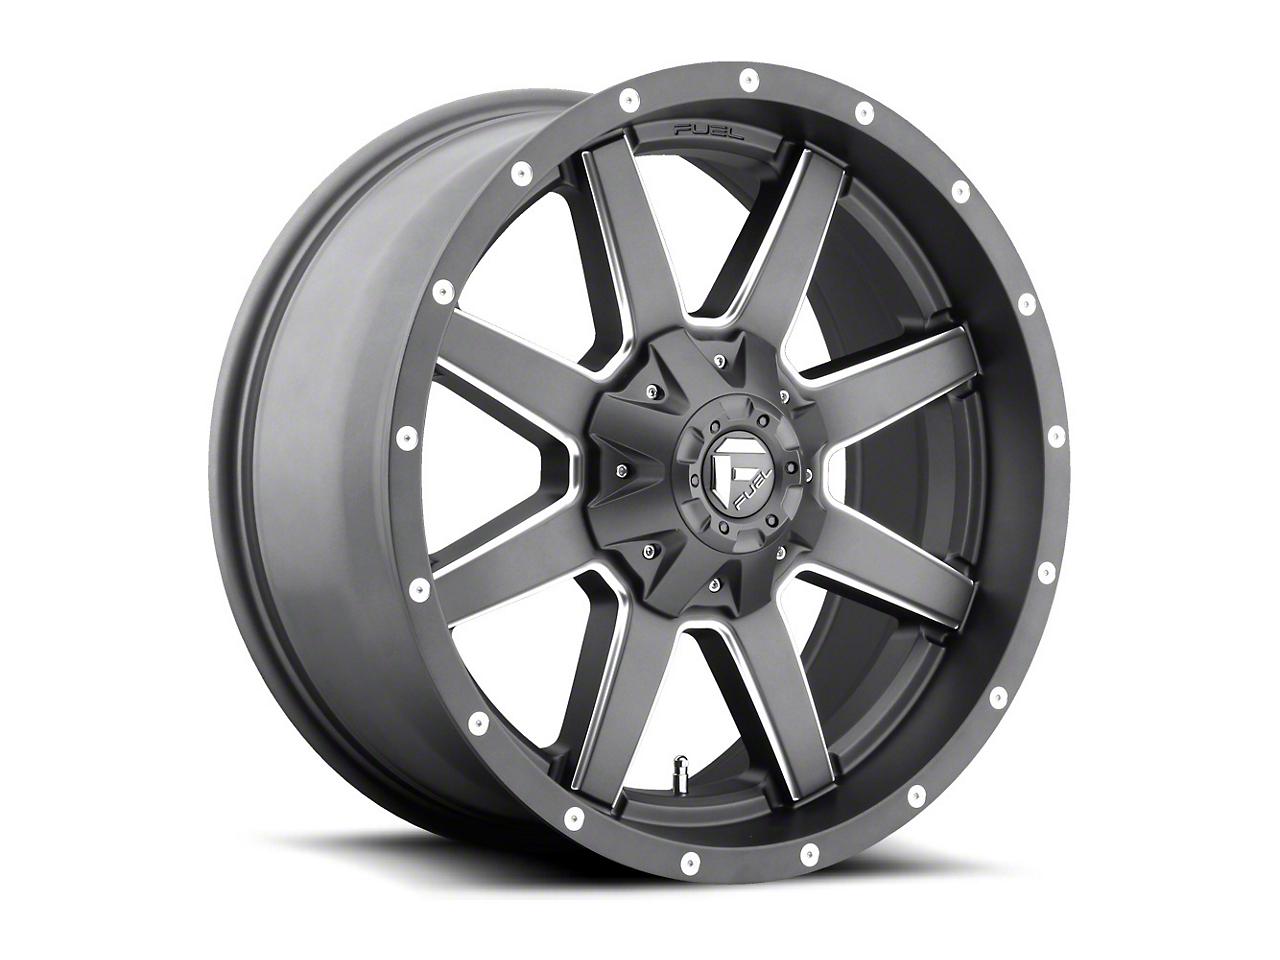 Fuel Wheels Maverick Gun Metal 5-Lug Wheel - 20x10 (02-18 RAM 1500, Excluding Mega Cab)